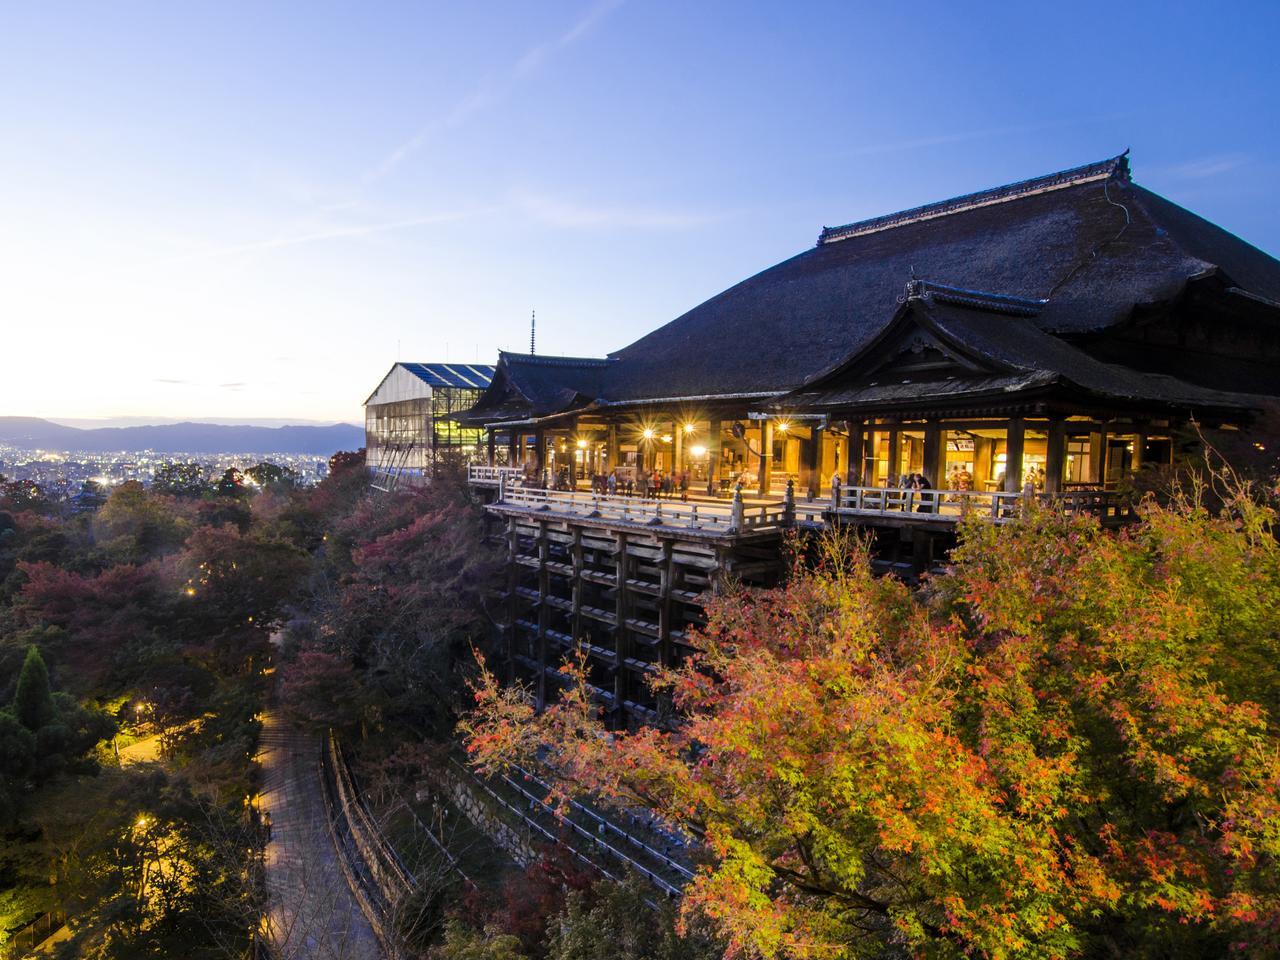 Kiyomizu Temple at twilight in Kyoto